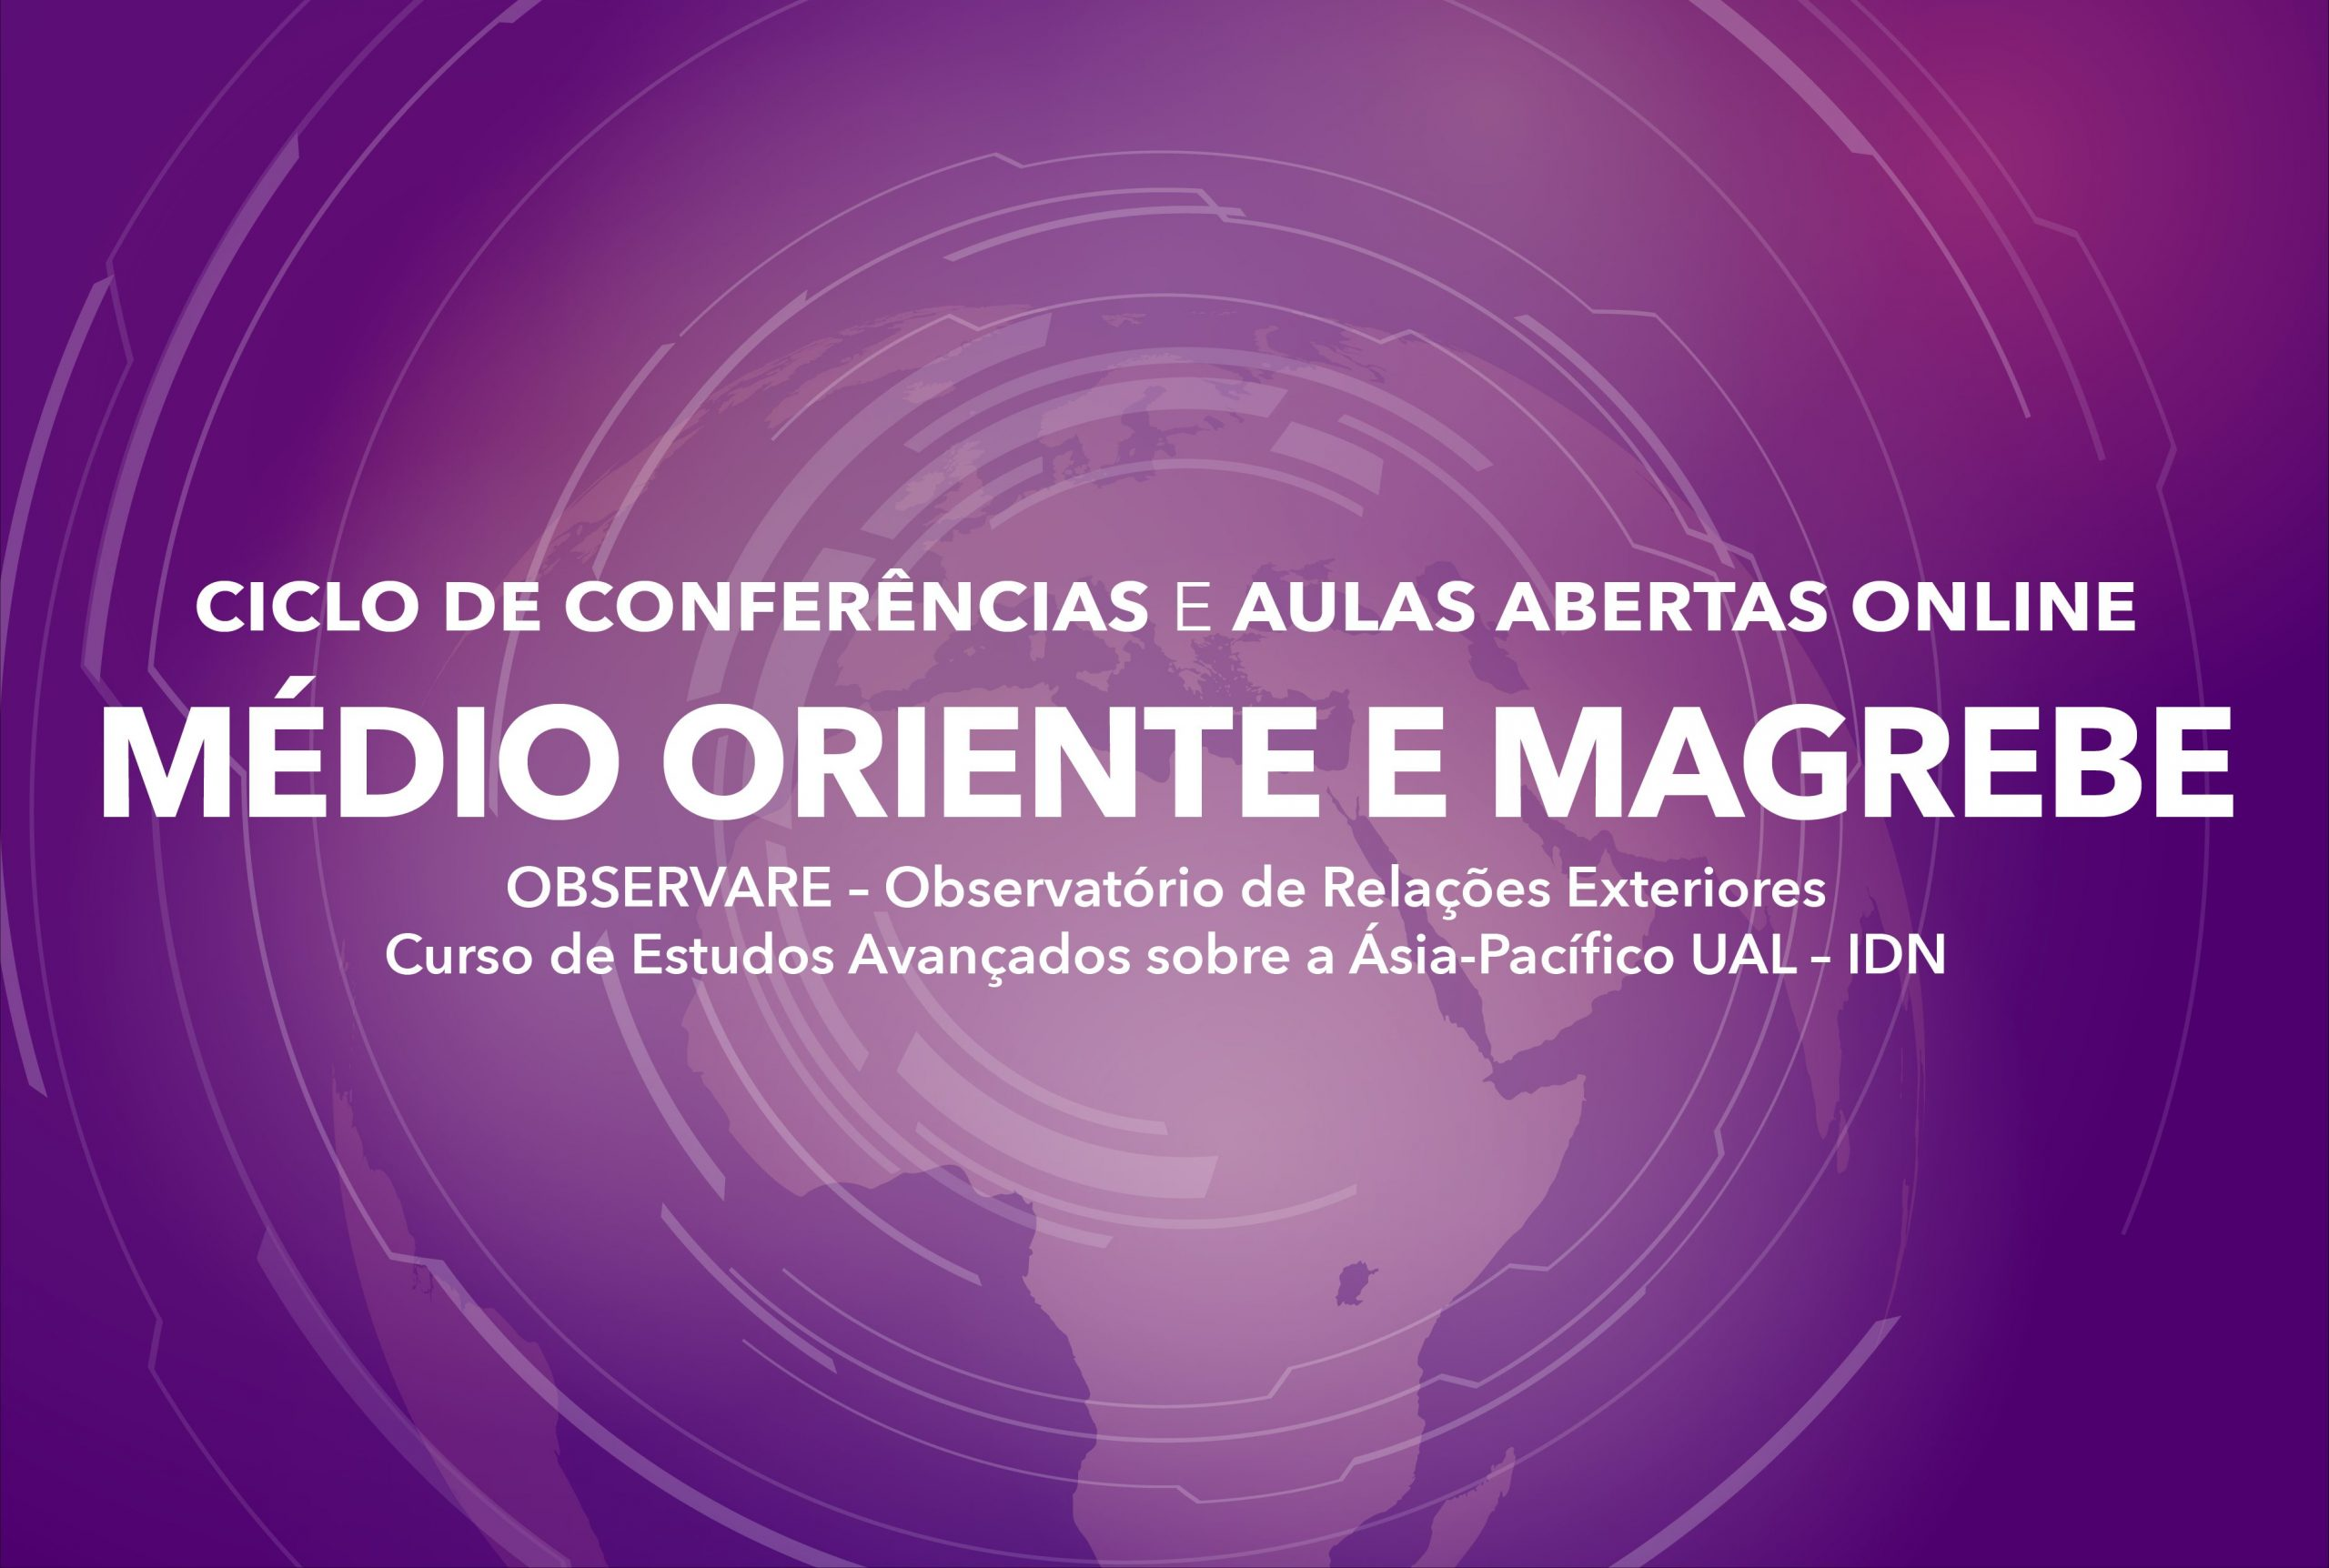 """MÉDIO ORIENTE E MAGREBE"" – CICLO DE CONFERÊNCIAS E AULAS ABERTAS | UAL-IDN"